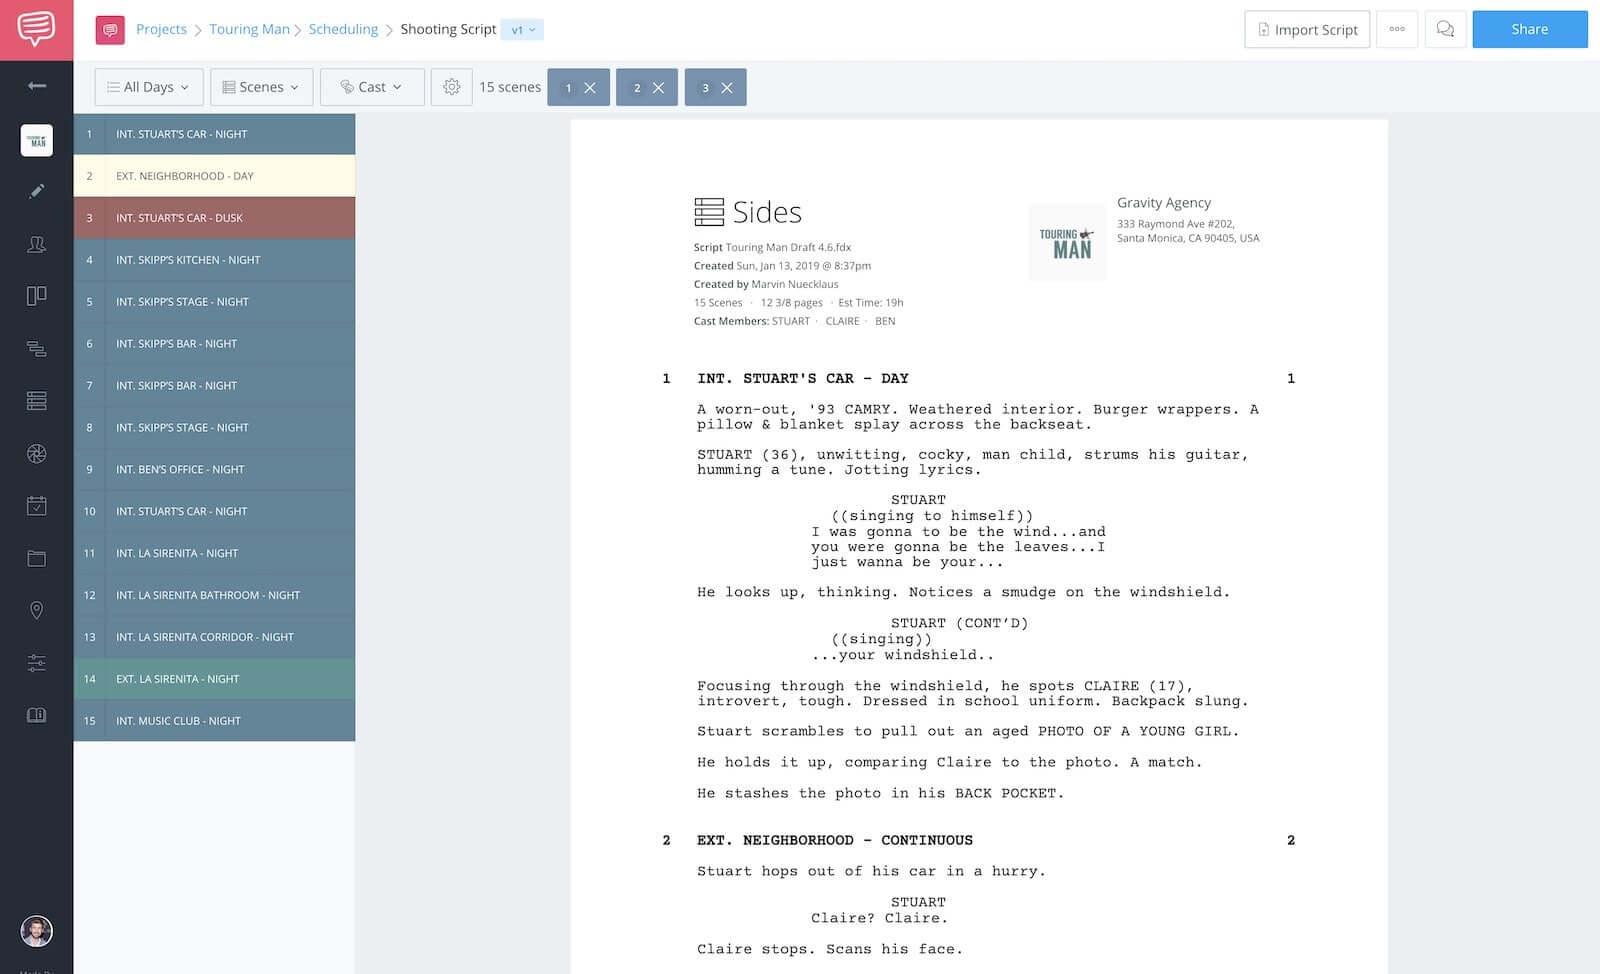 StudioBinder Film Scheduling Software - Create Script Sides Online